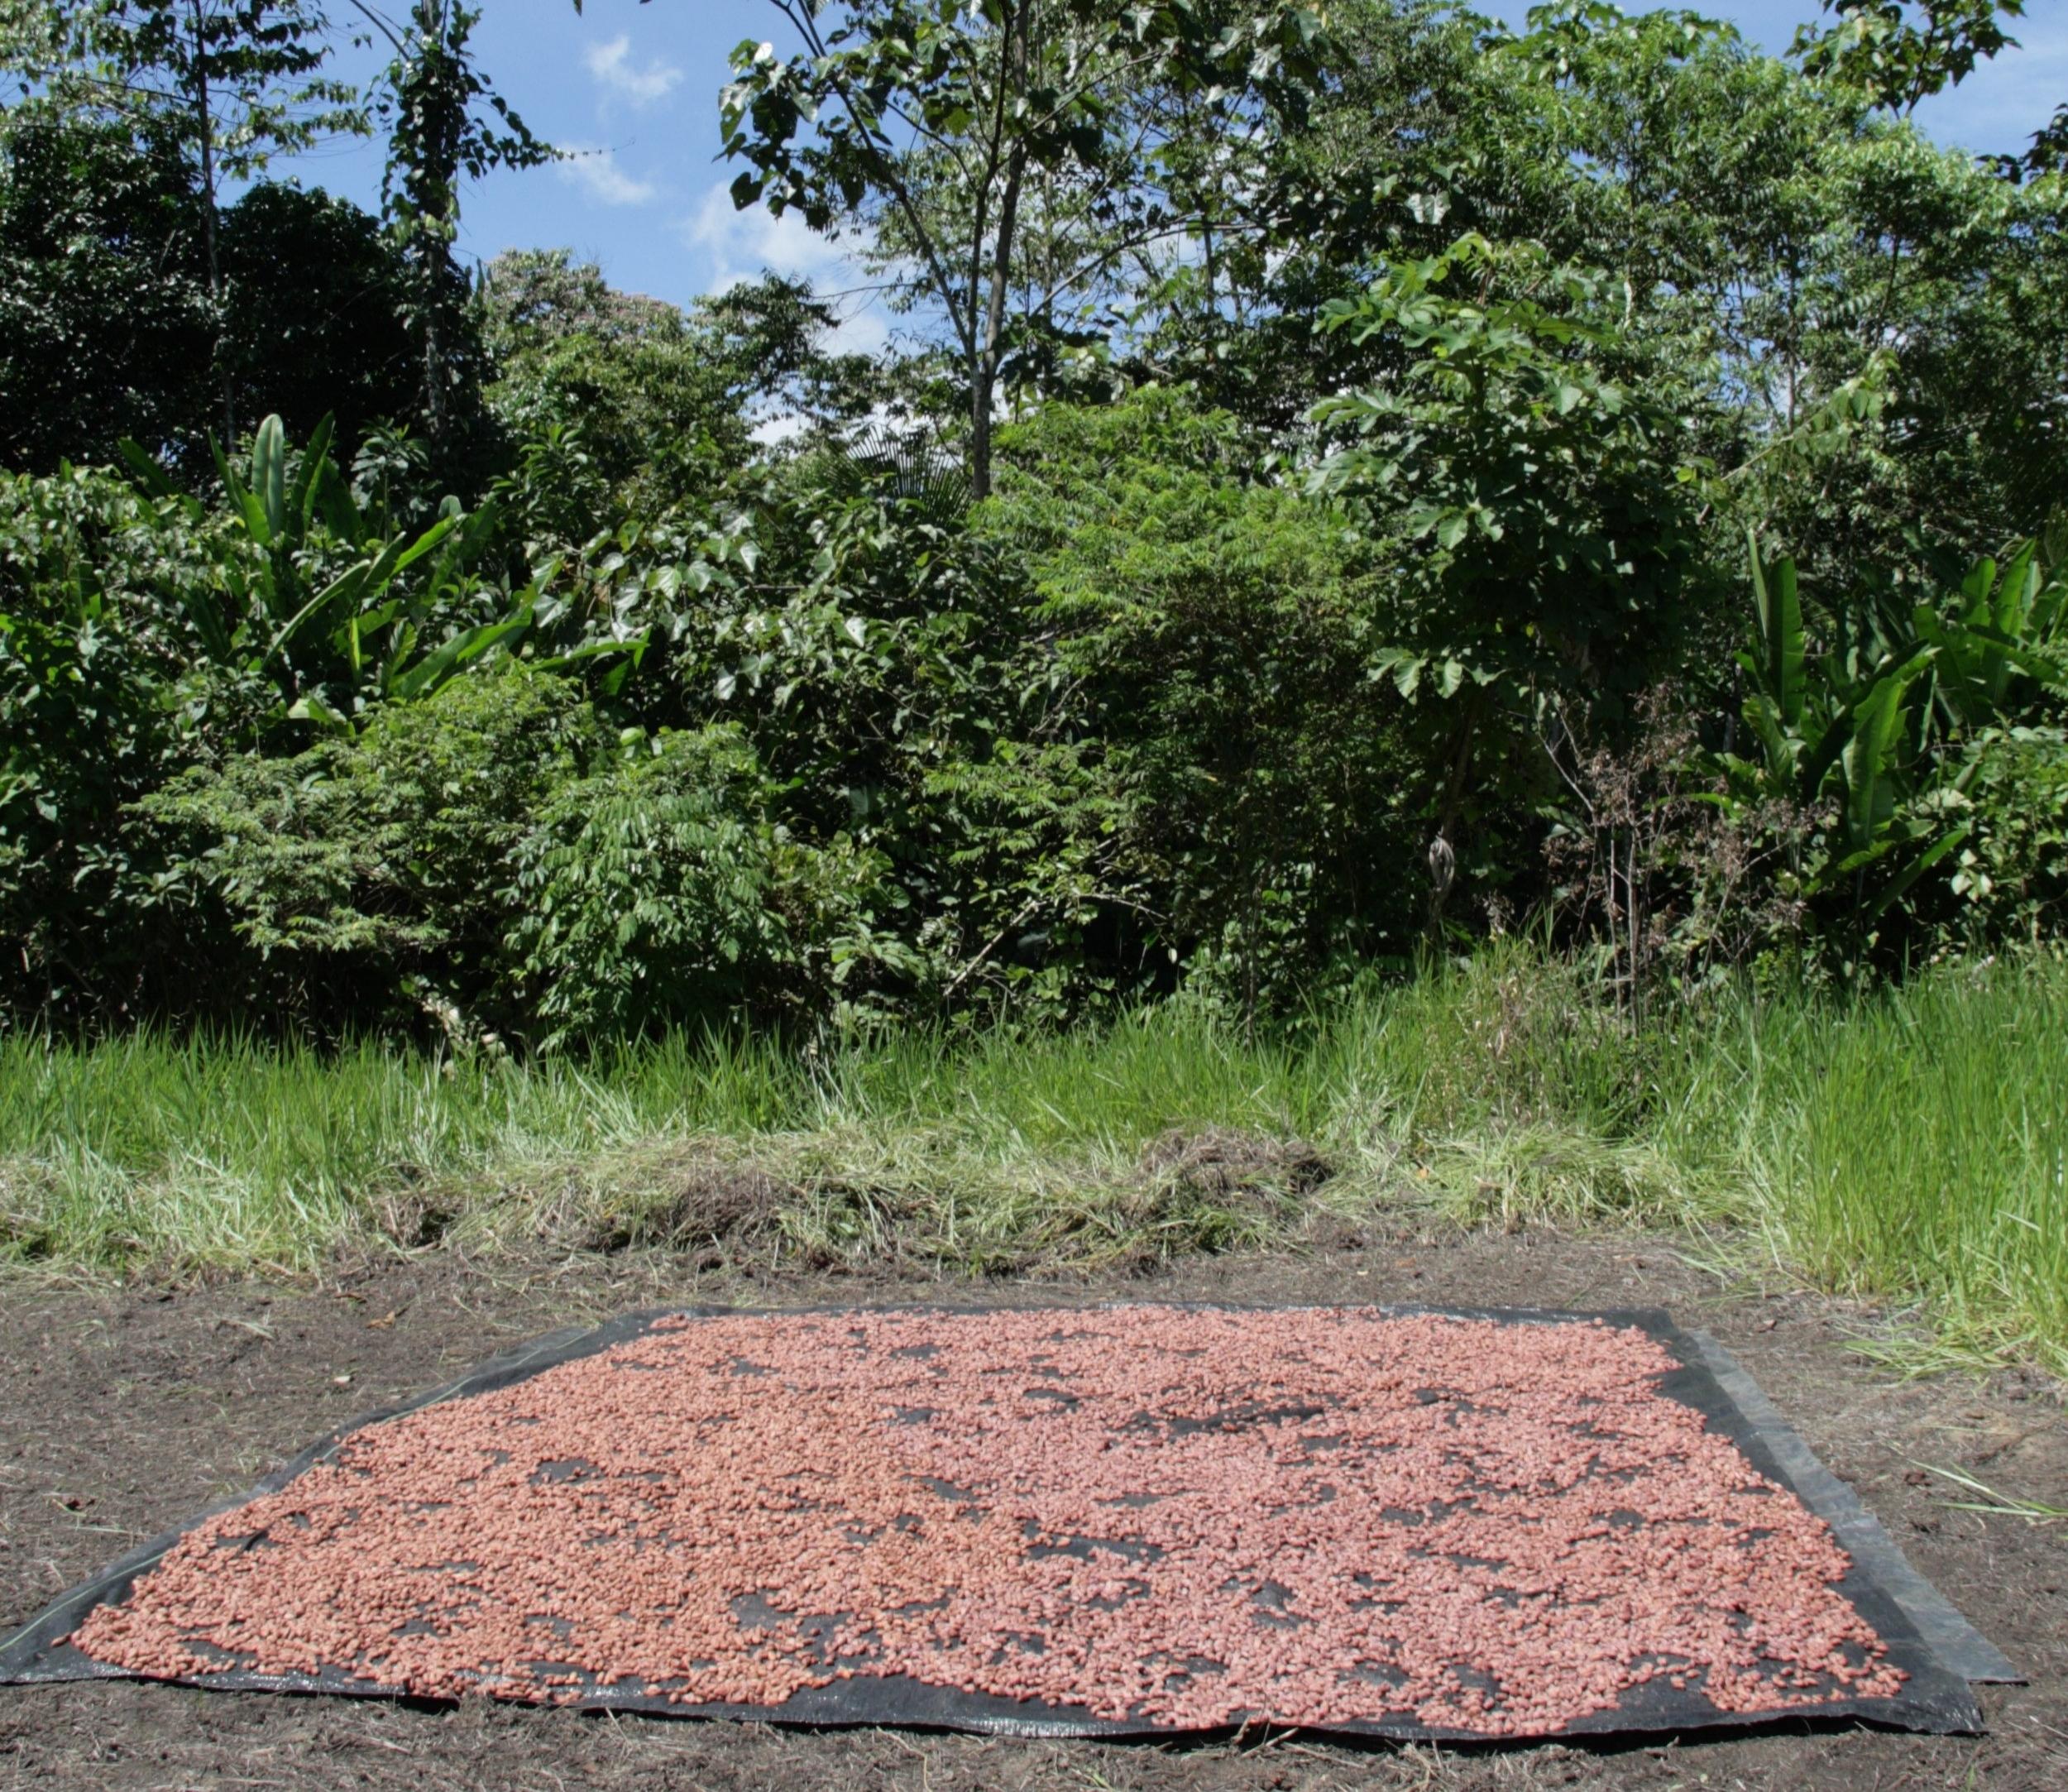 Garcoa Peru Curimana Kakao Trocknen.jpeg